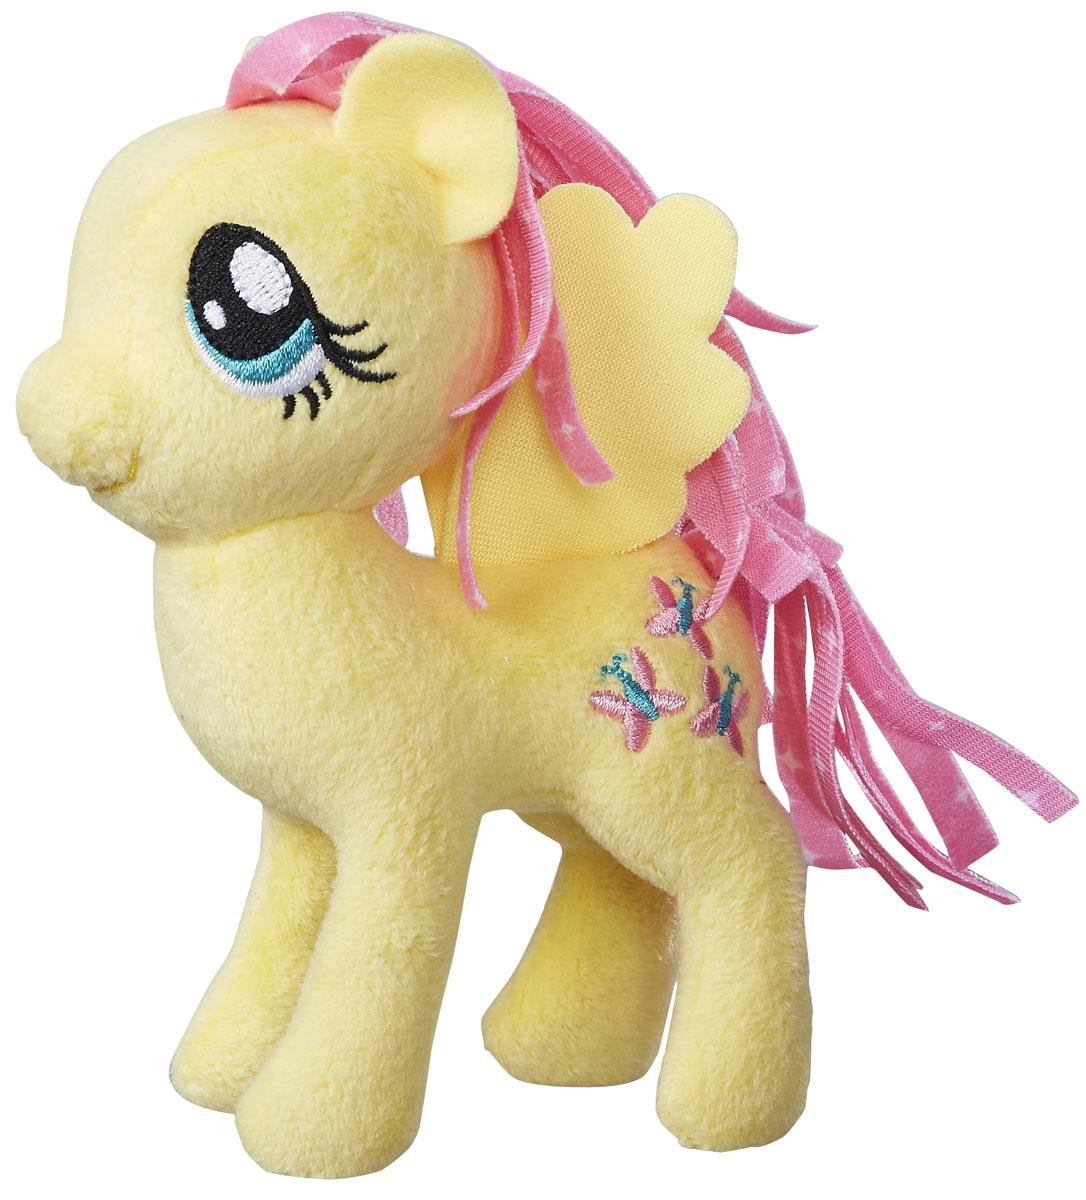 My Little Pony Мягкая игрушка Пони Fluttershy 13 см